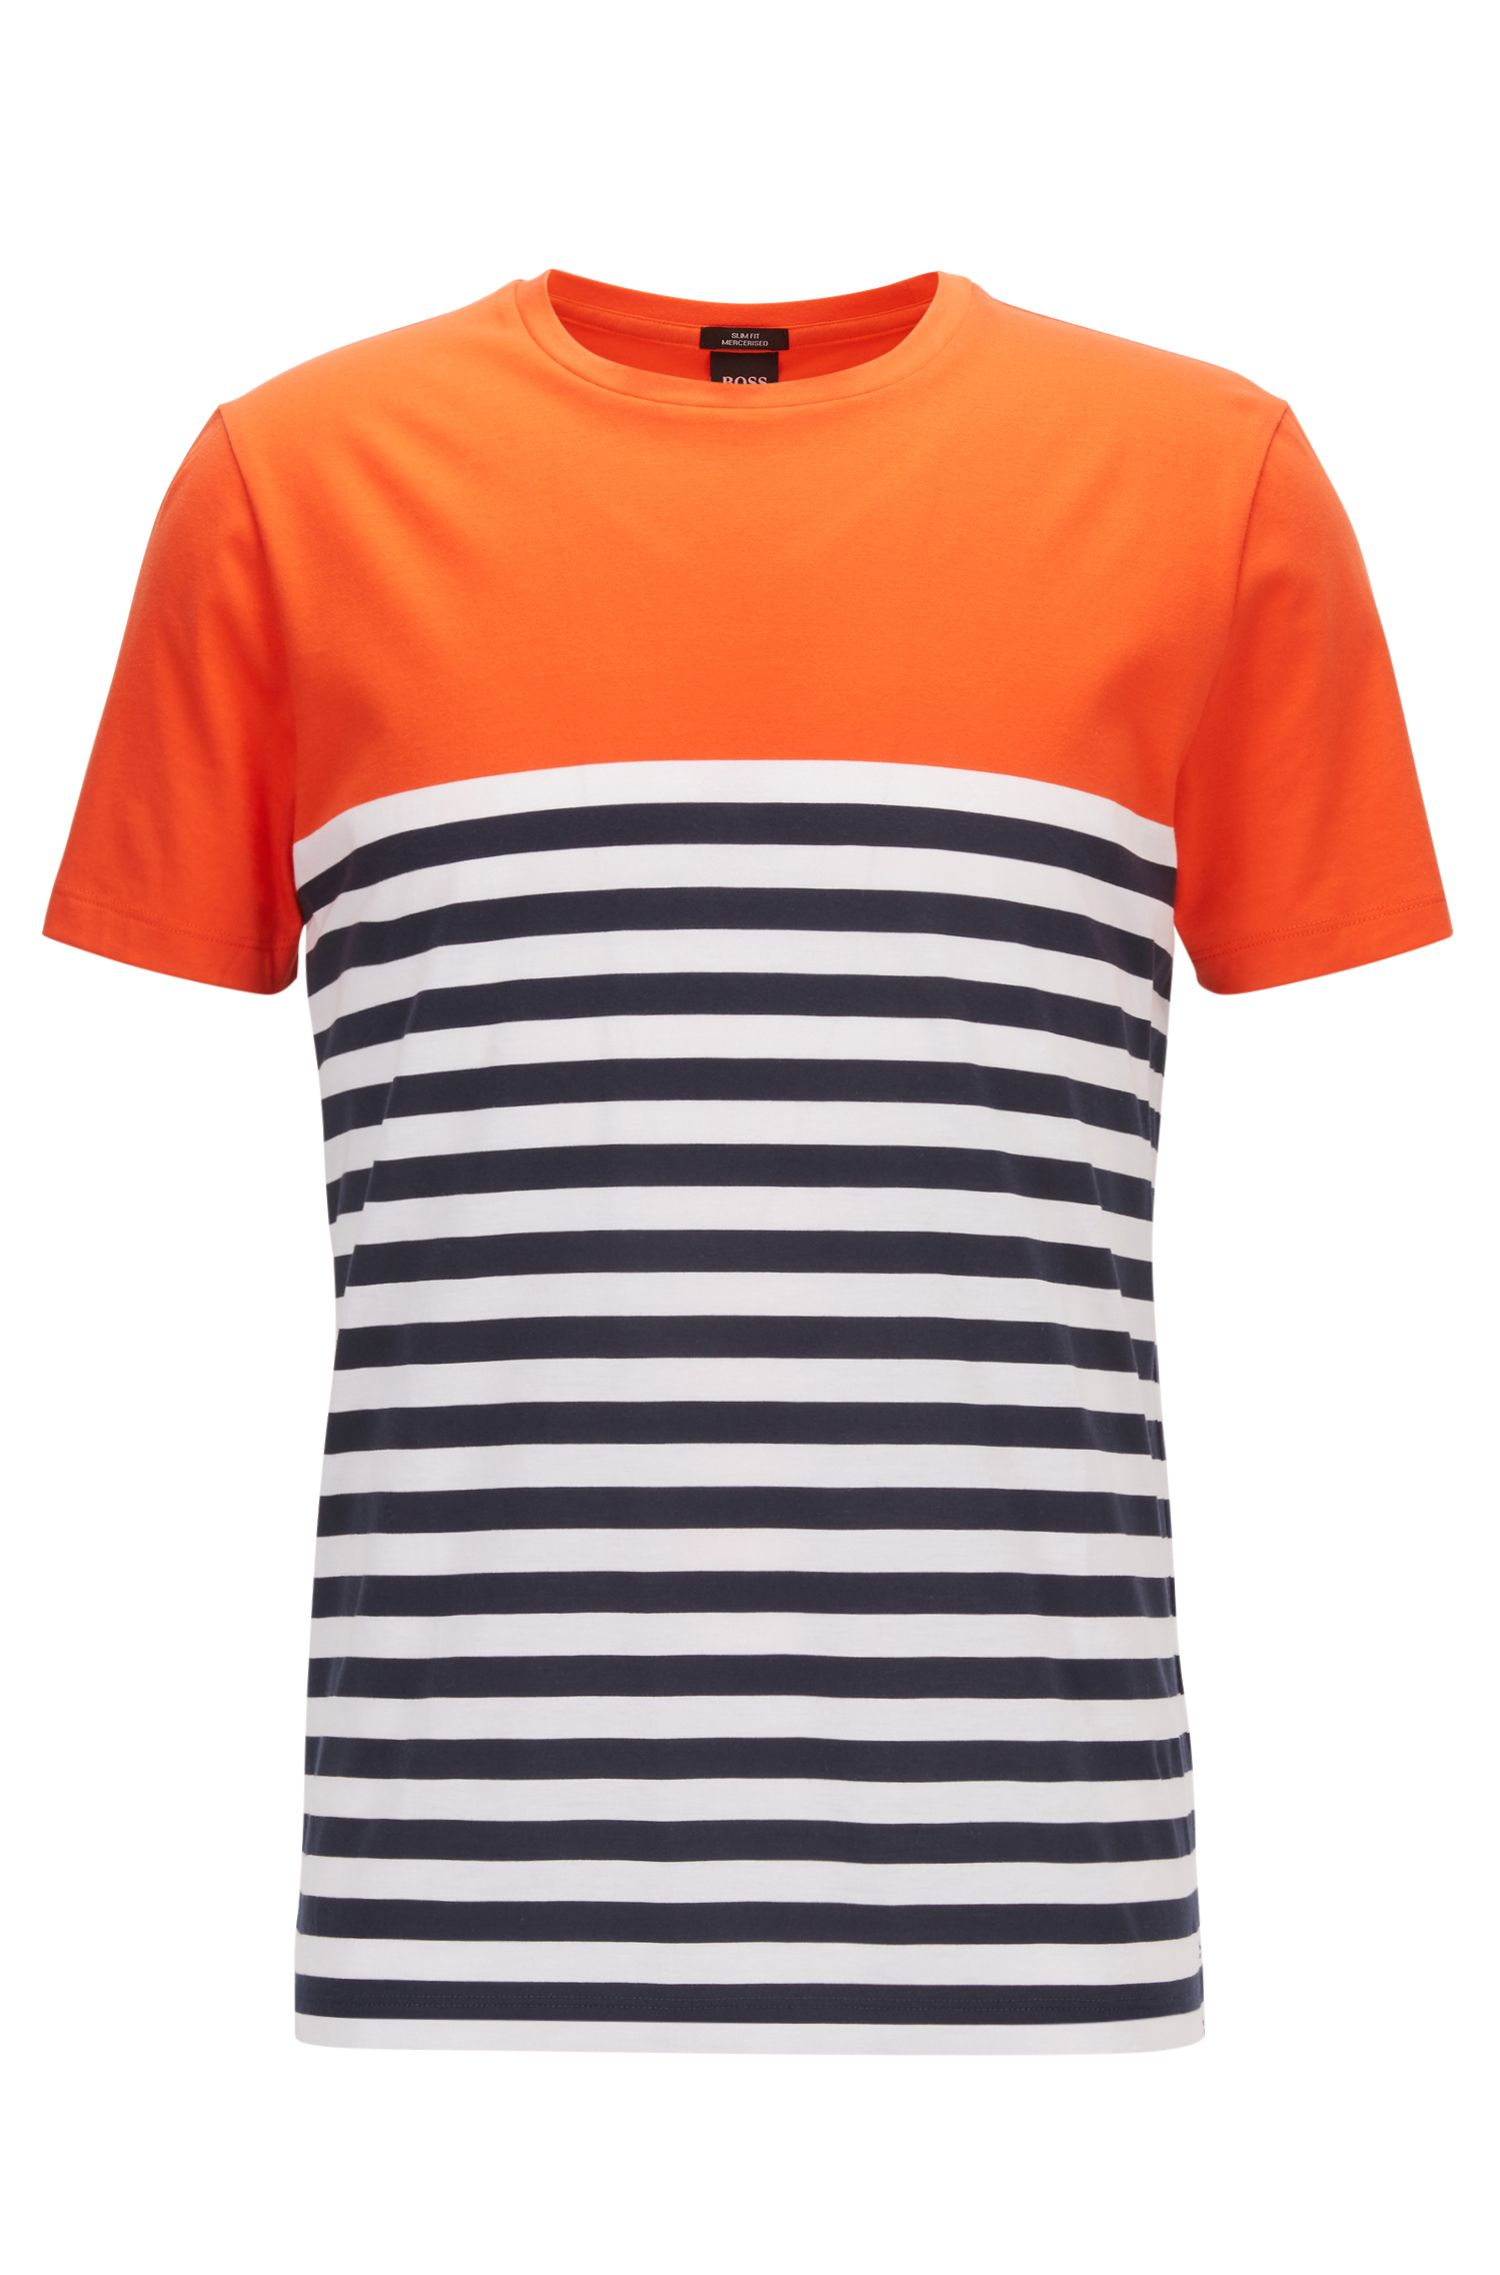 Stripe Colorblock T-Shirt | Tessler